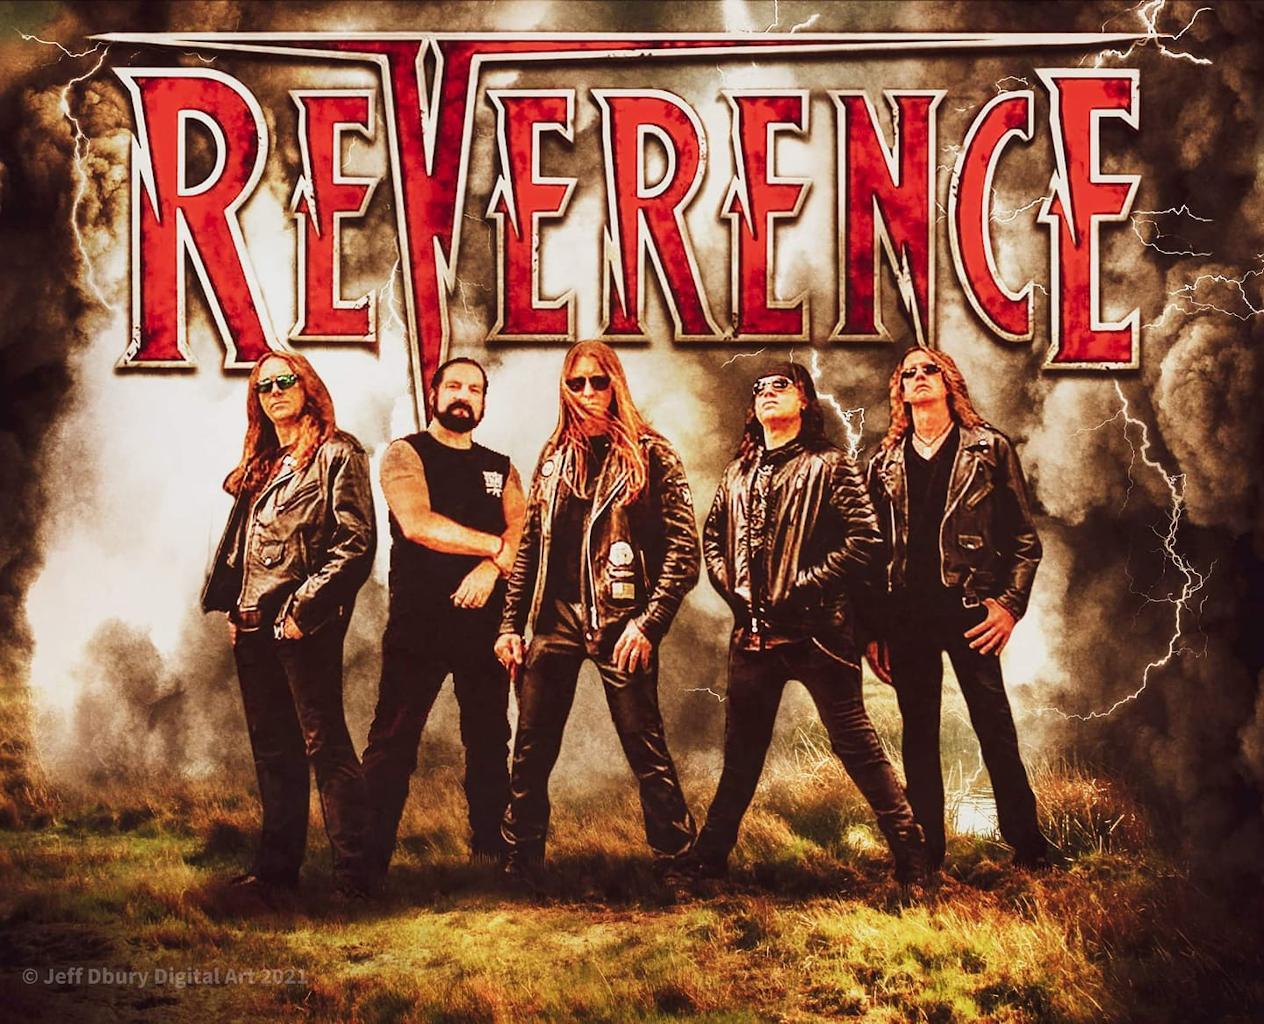 Reverence - Photo